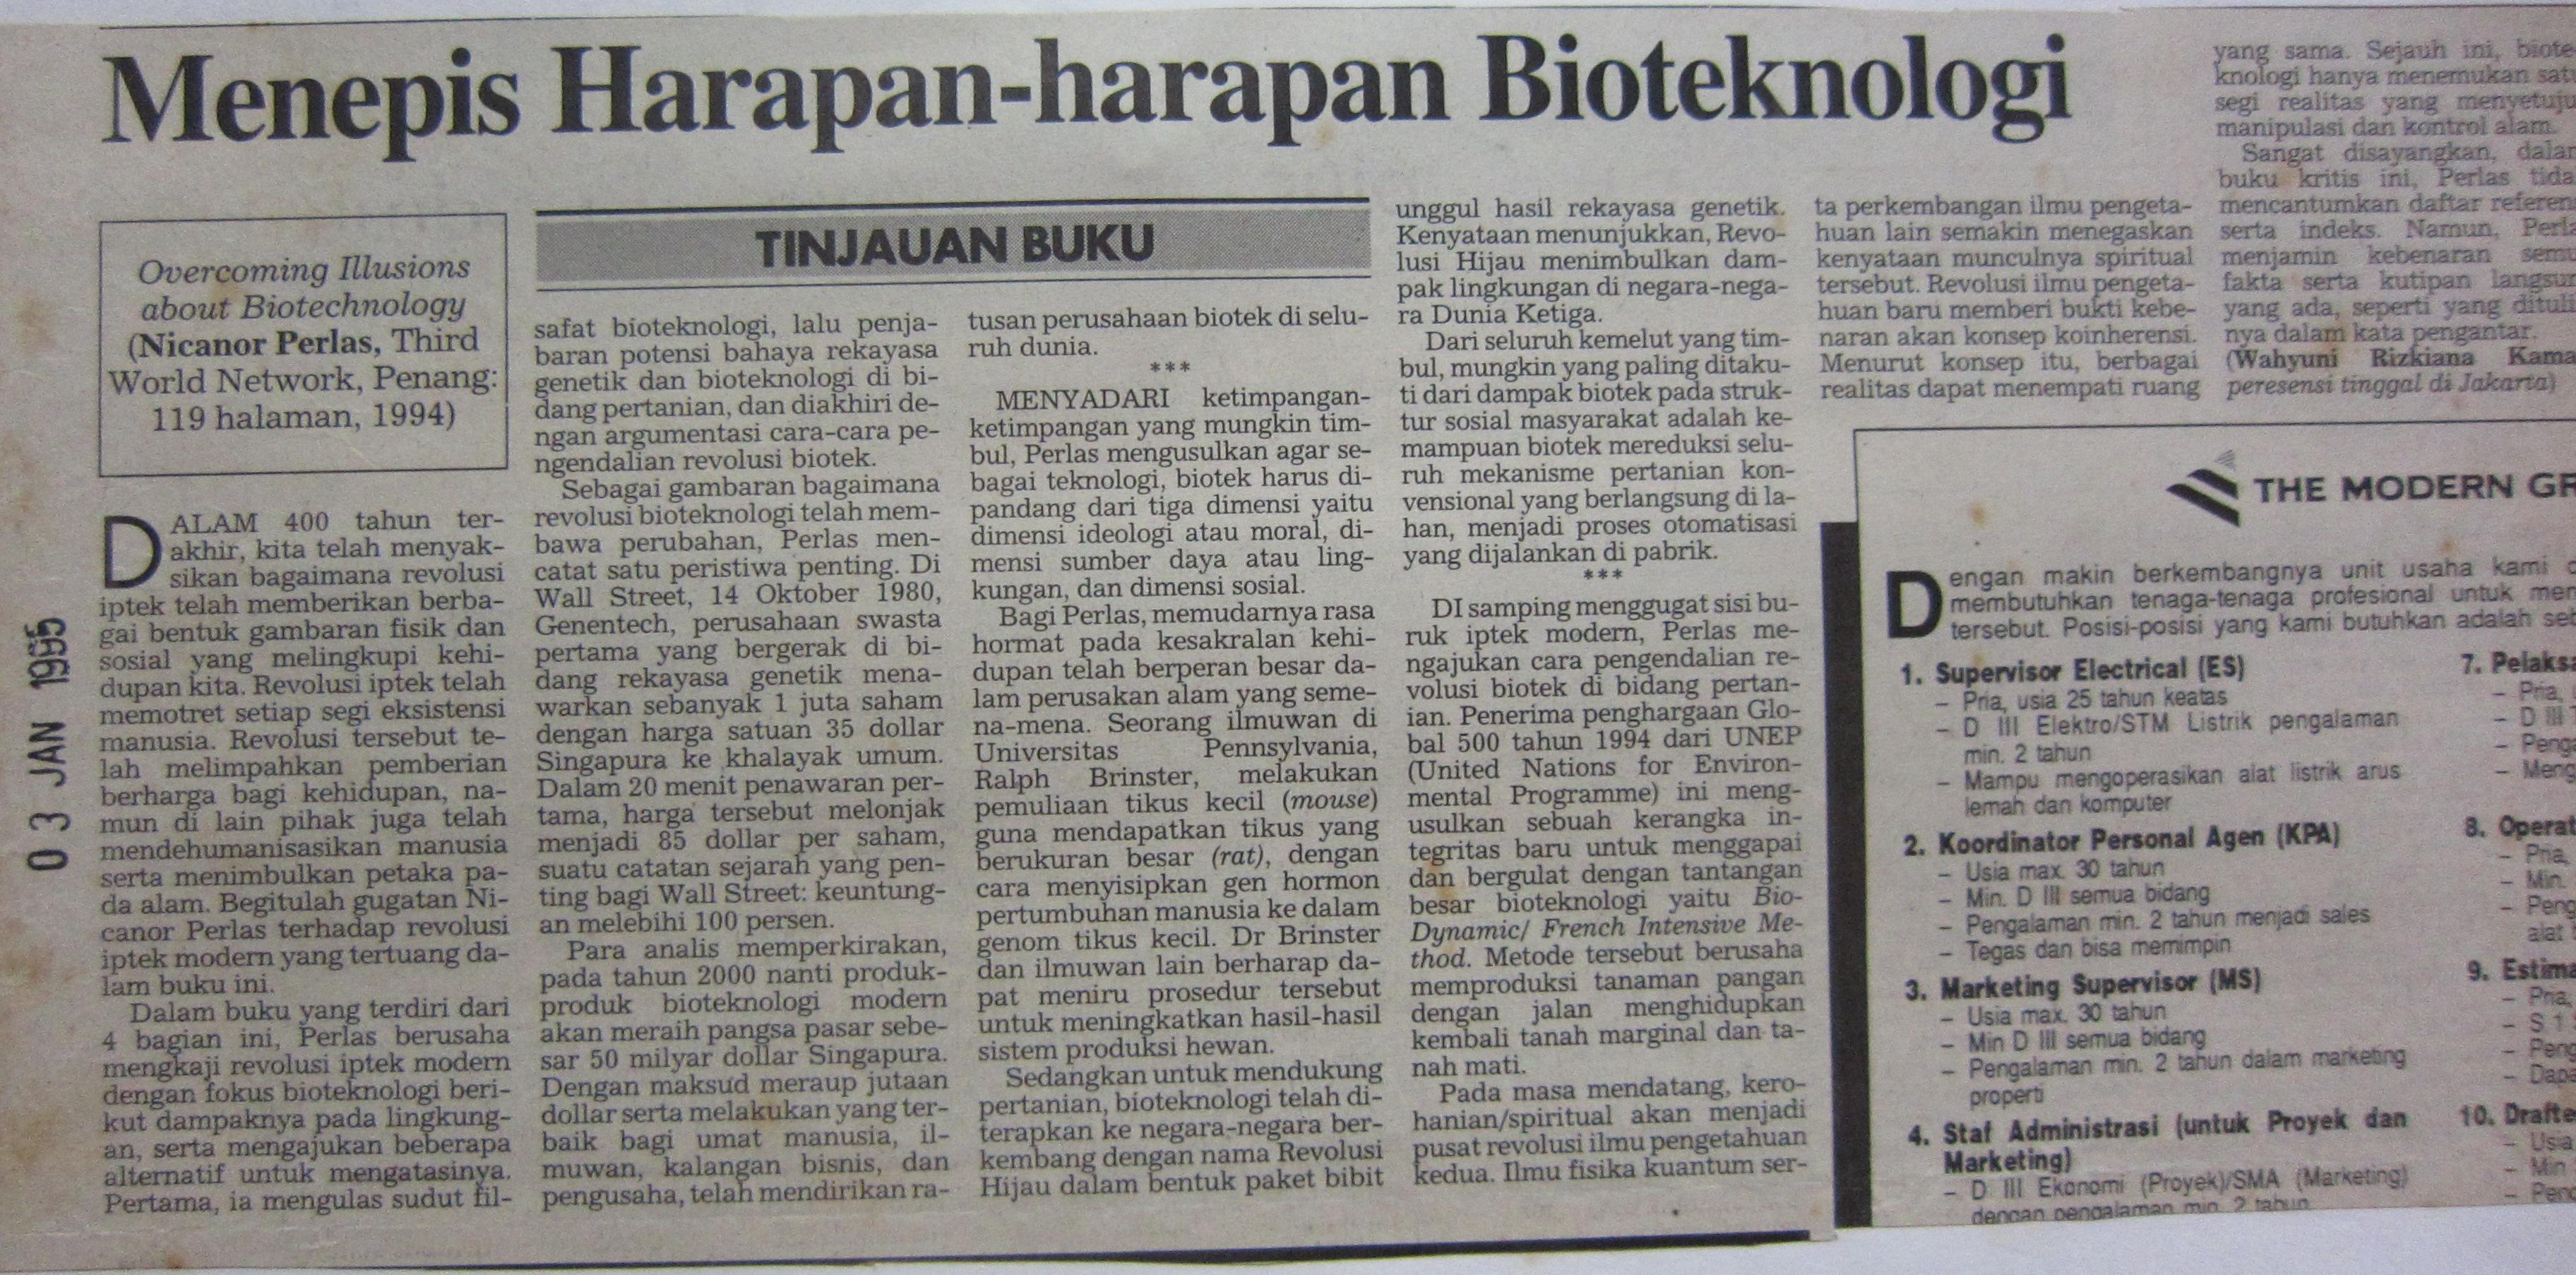 1995 Jan 3, KompasMenepis Harapan harapan Bioteknologi